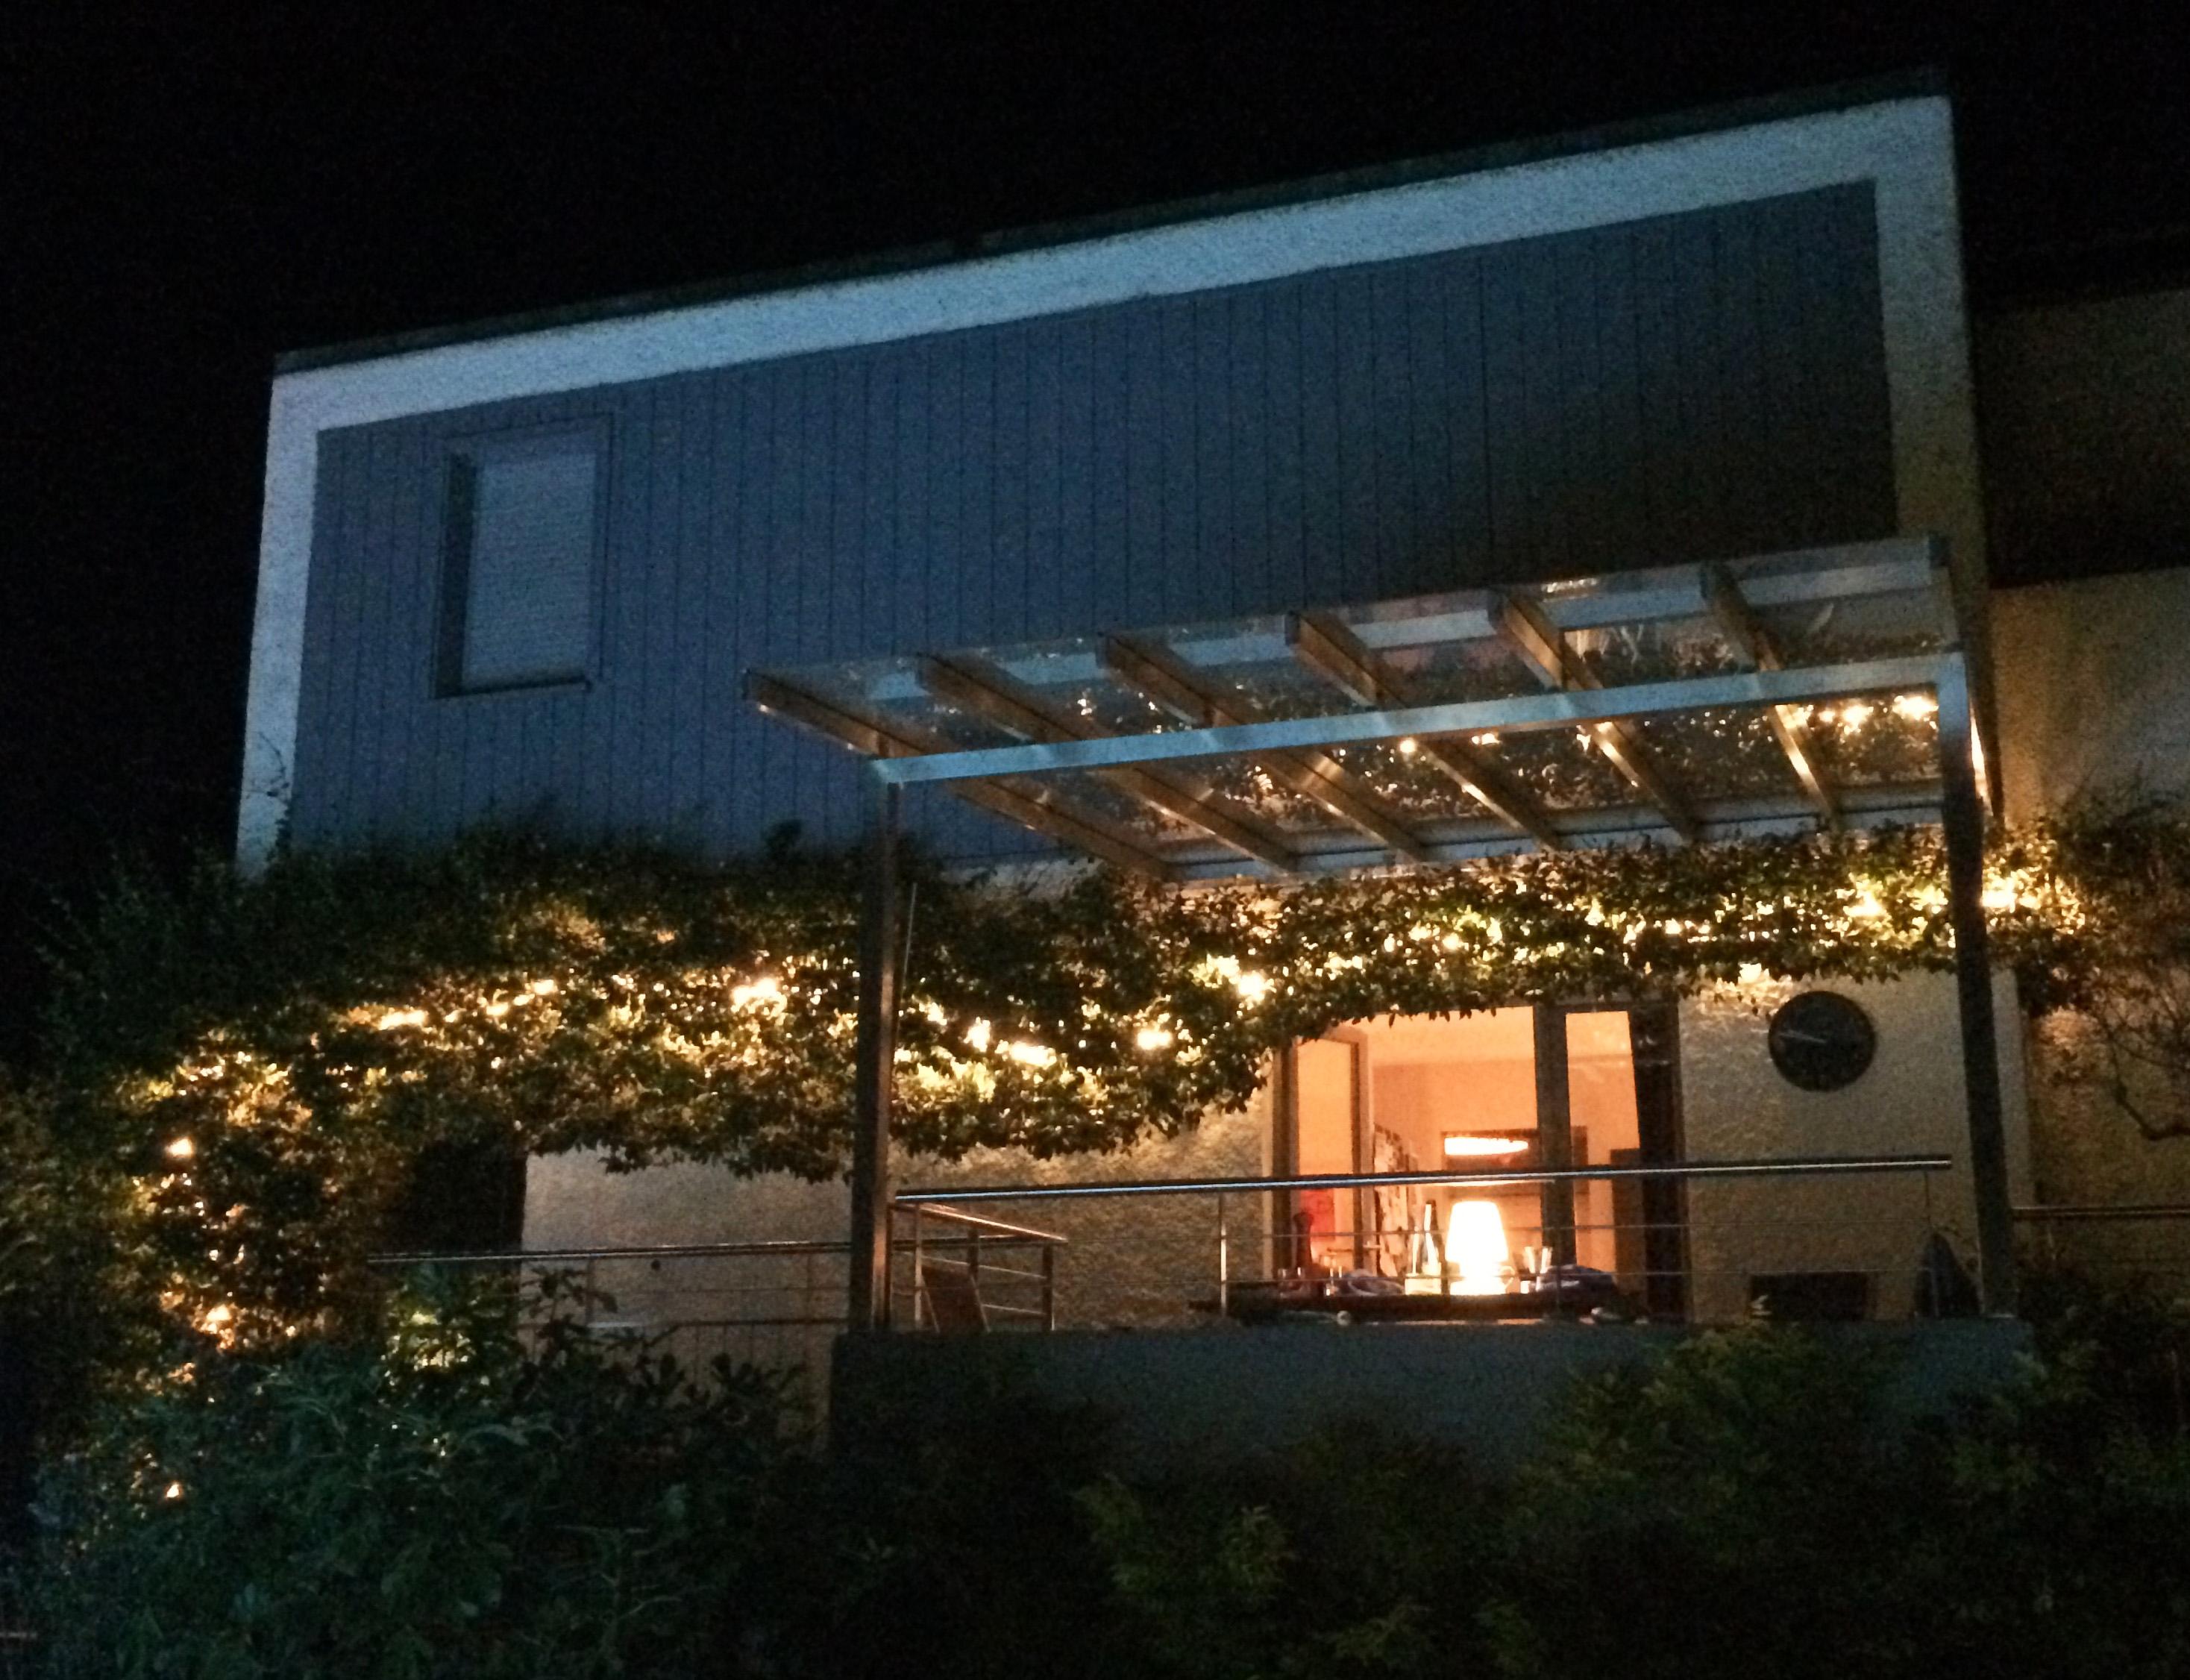 Jardin luxuriant eclair a geneve jardins de nuit - Eclairage exterieur contemporain ...